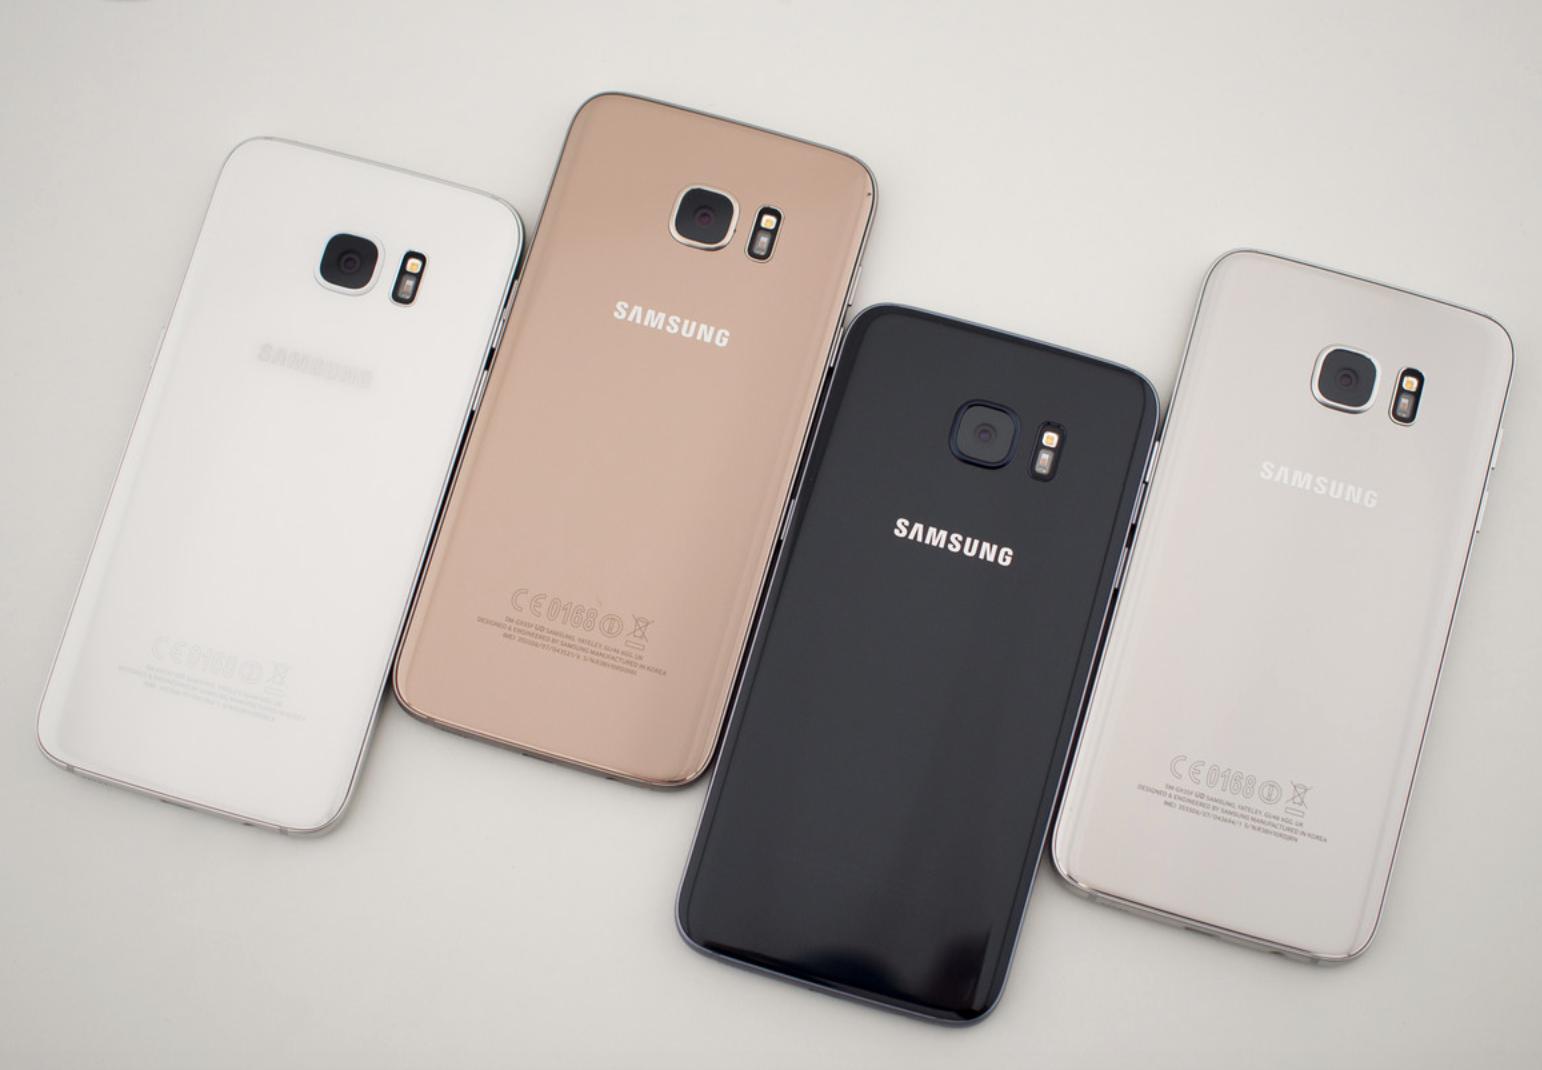 Samsung Galaxy S7 Edge: Is Bigger Always Better?